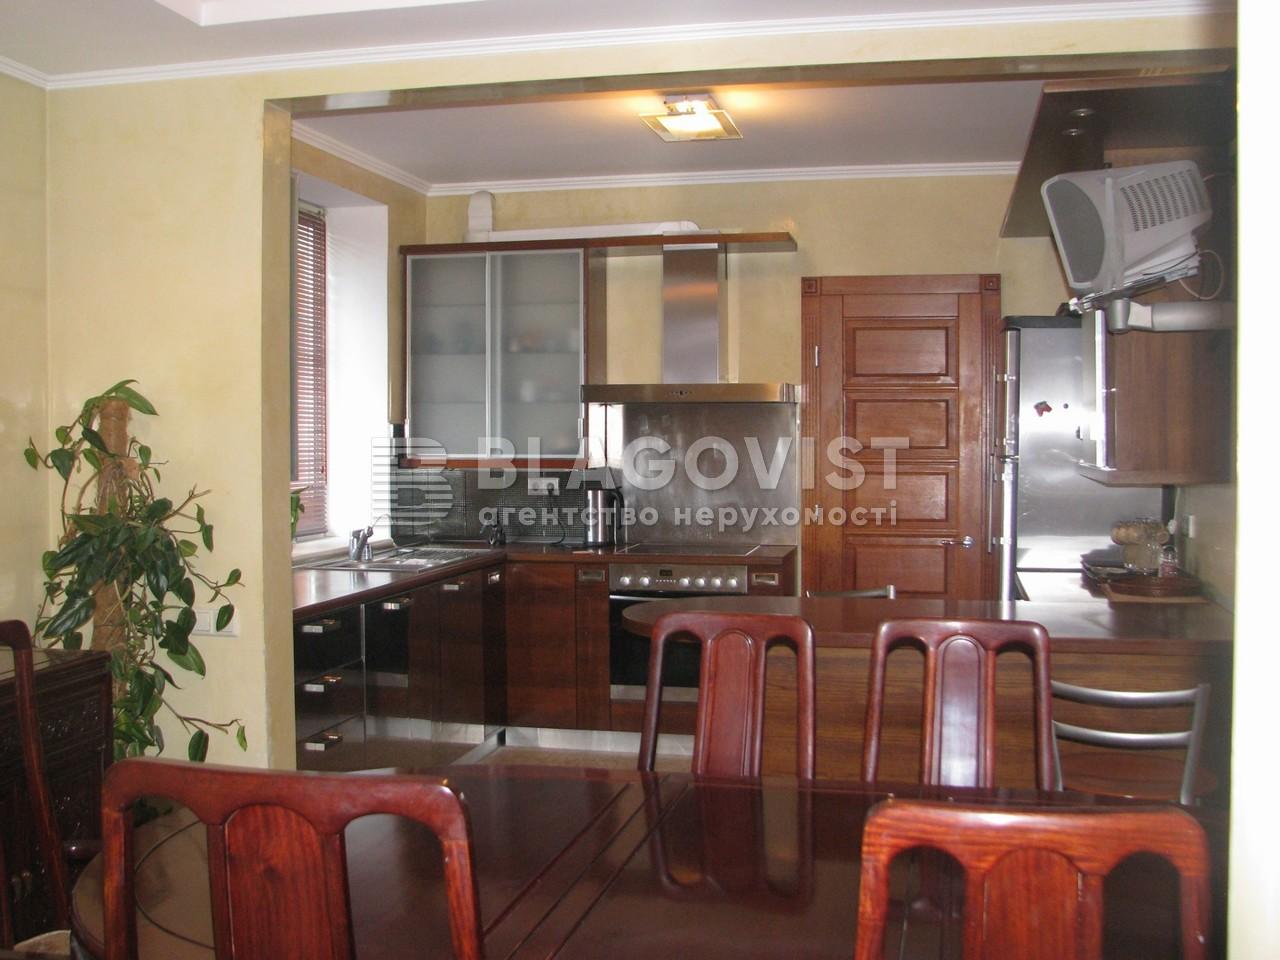 Квартира M-3707, Златоустовская, 10/12, Киев - Фото 12